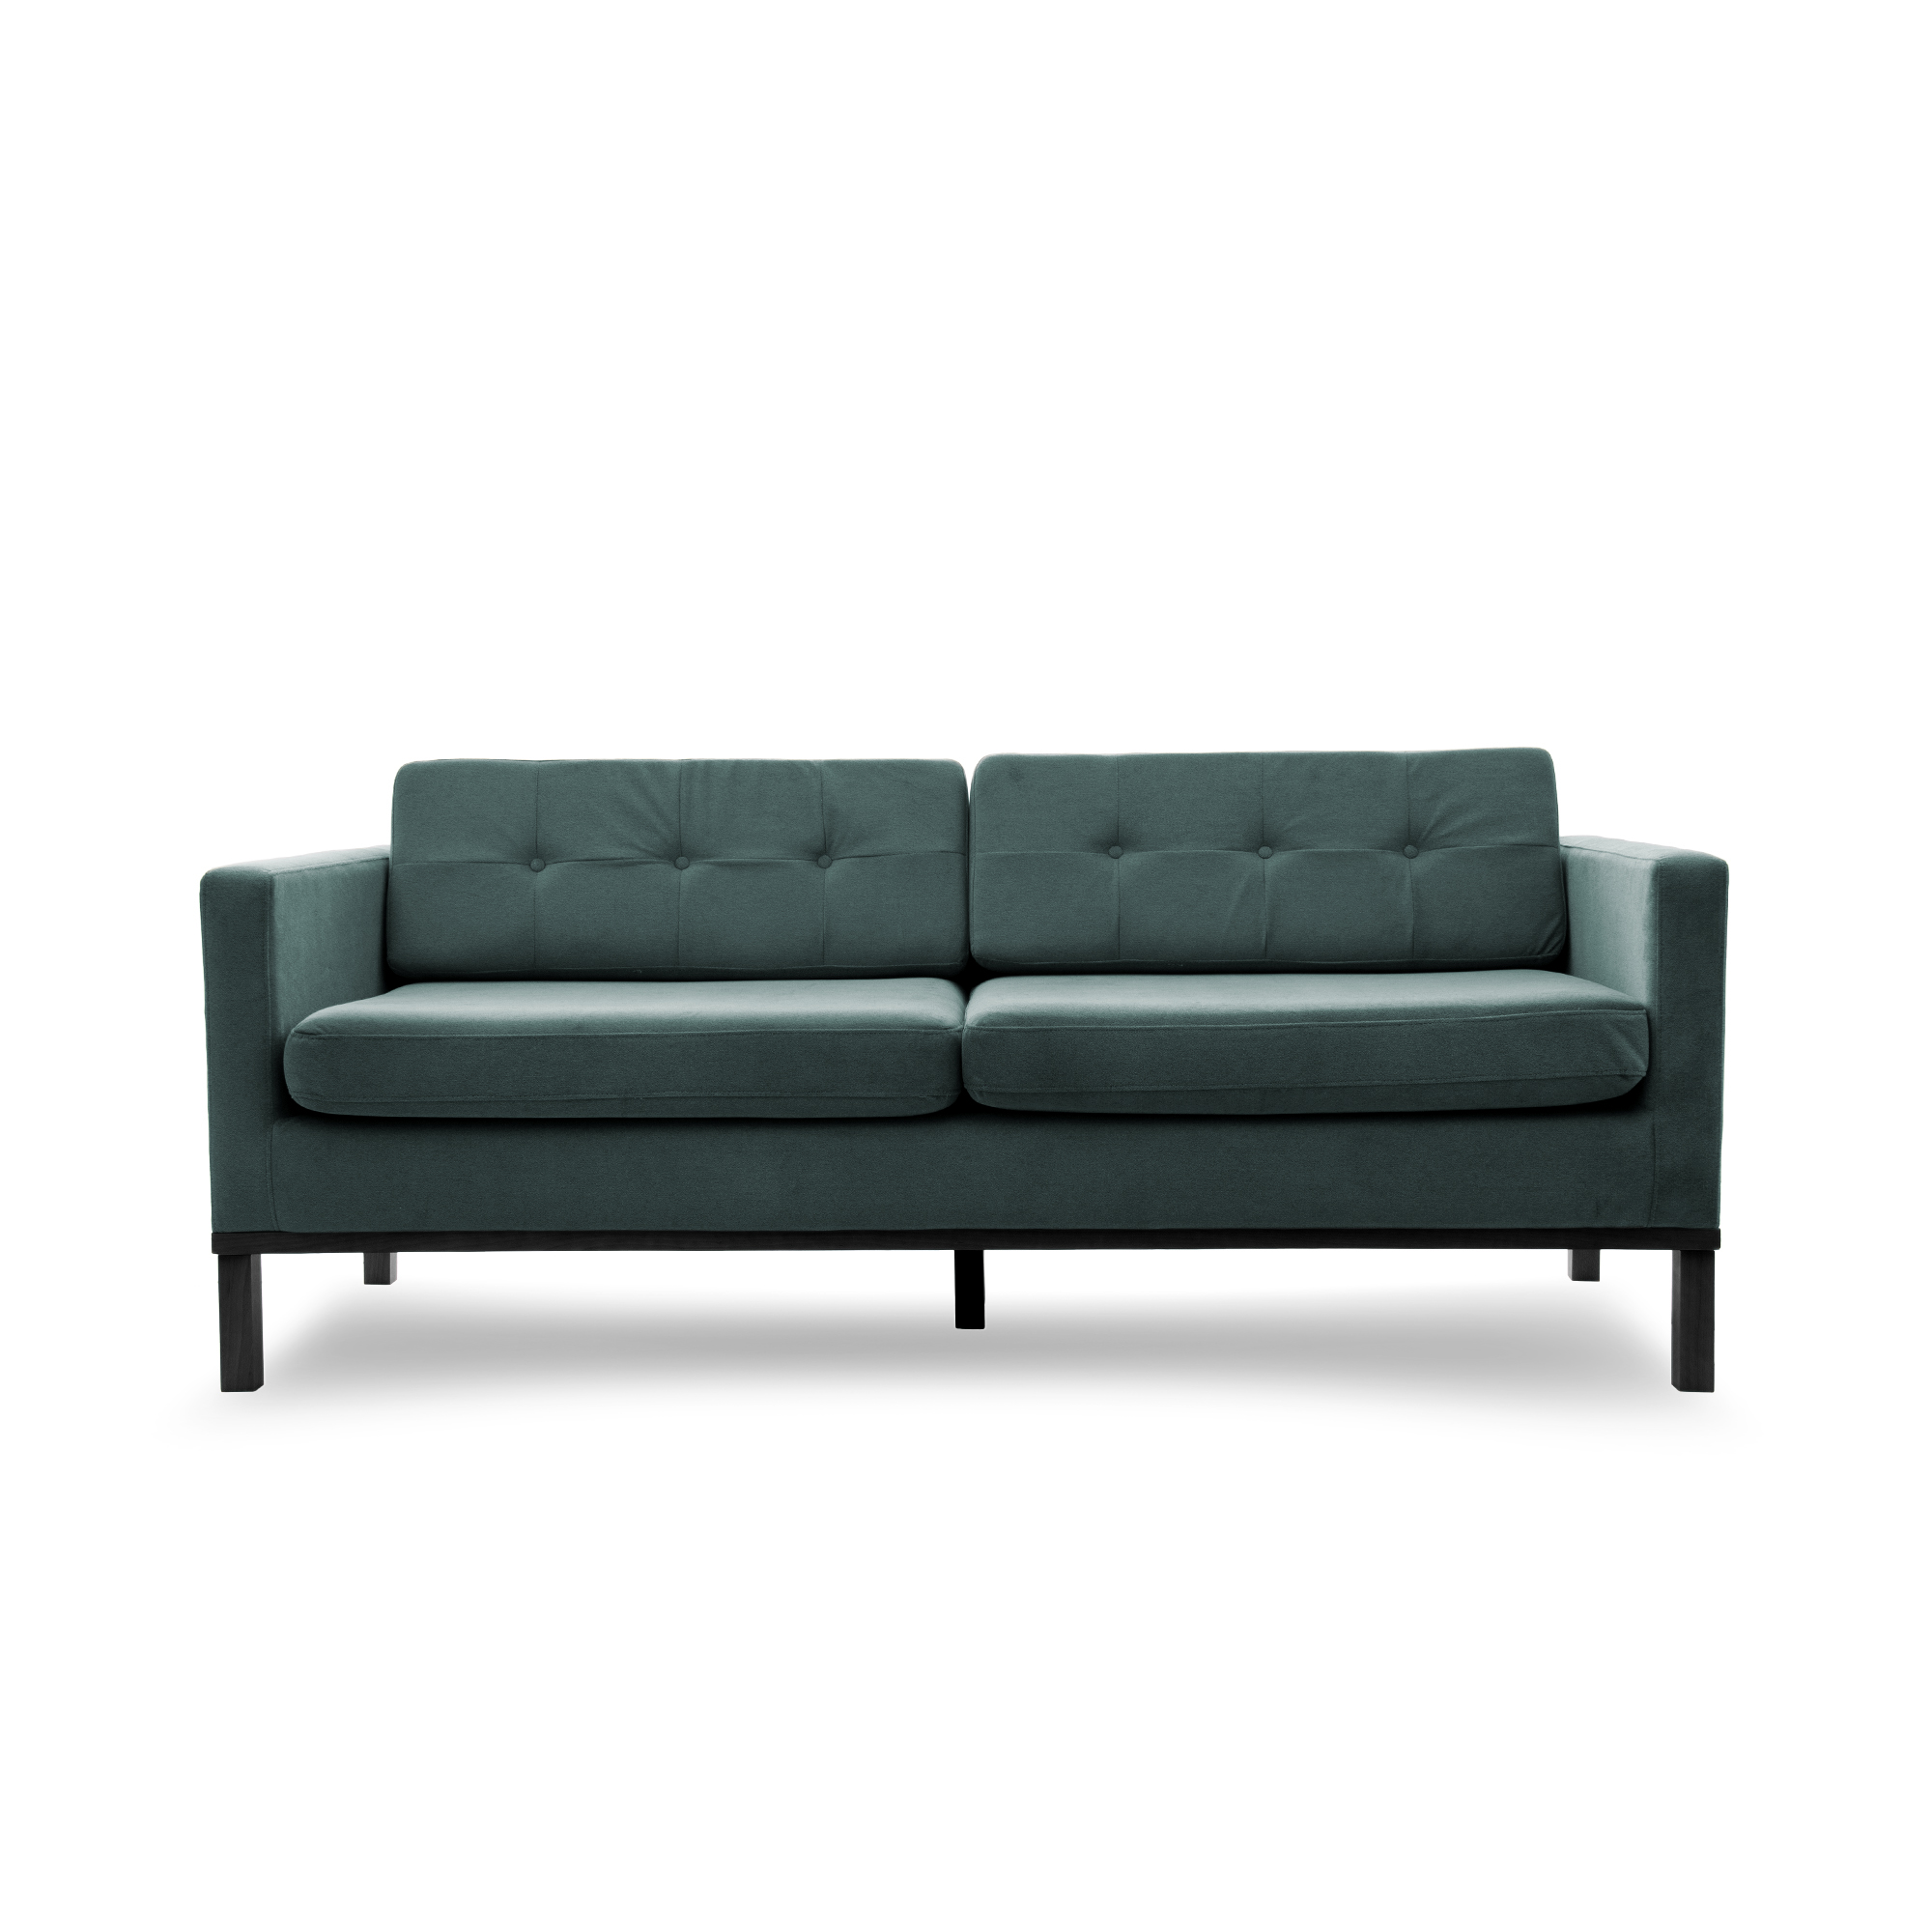 Canapea Fixa 3 locuri Jonan Light Blue/Black